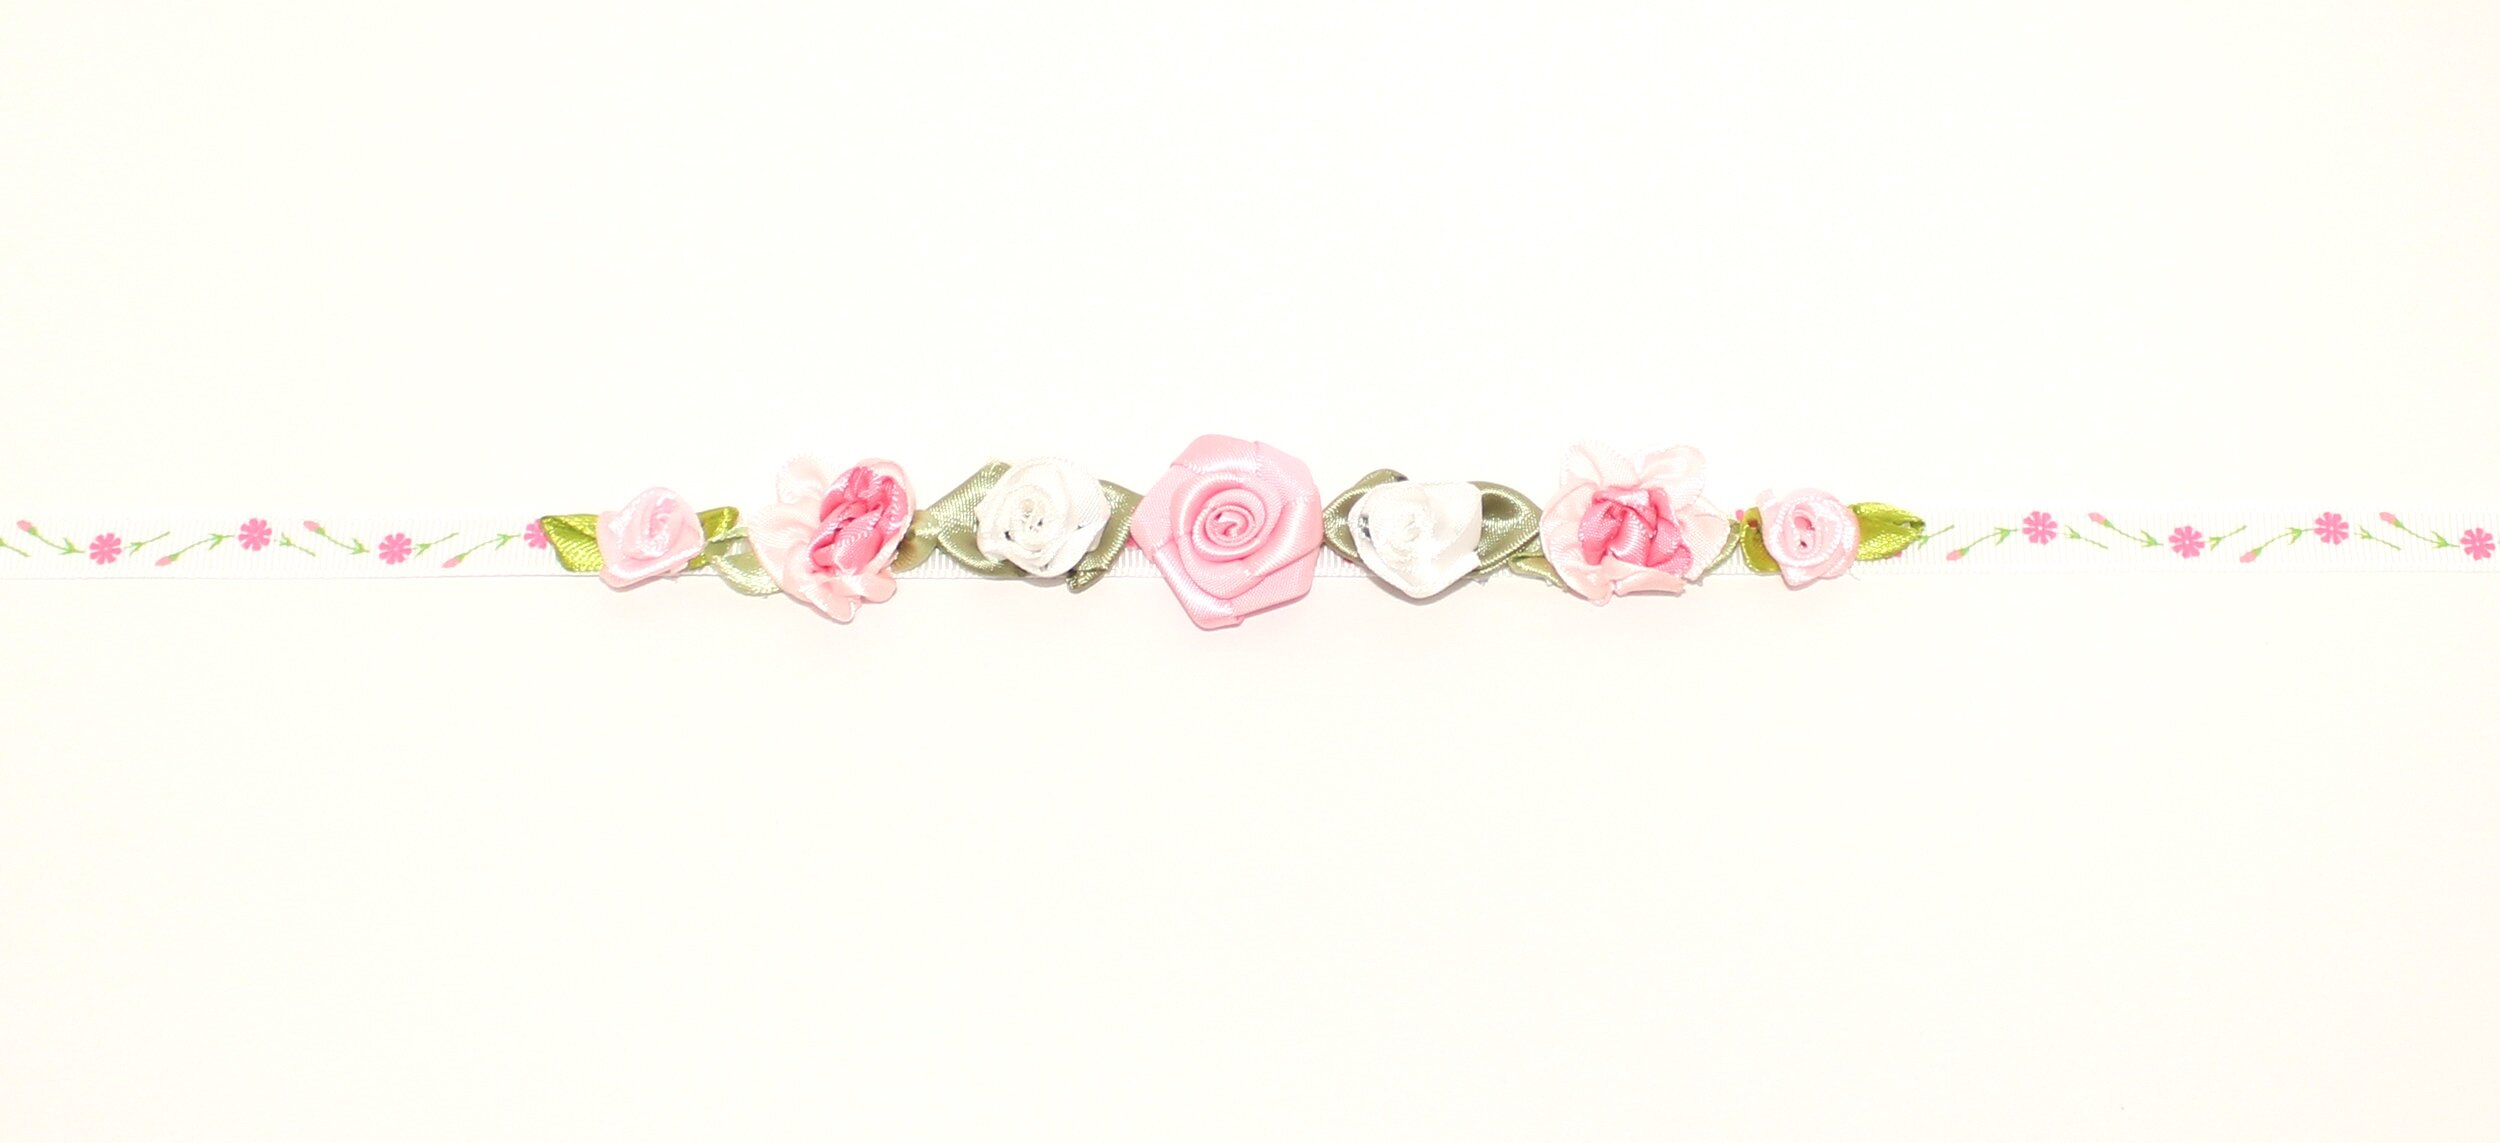 Ballet Bun Flower Garland Bunfun Flower Wreath Garland For Your Ballet Bun Collection Of Two Pink Shop At Dancer Nyc